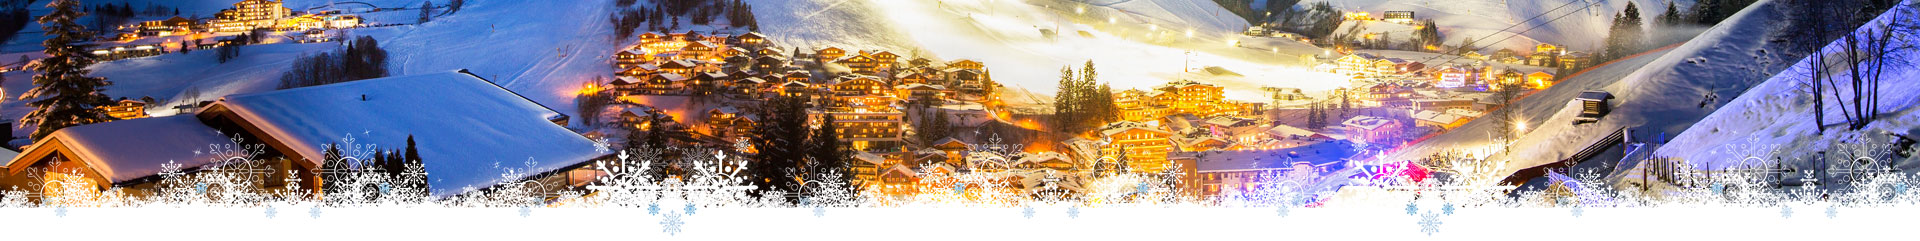 skihotels-piste